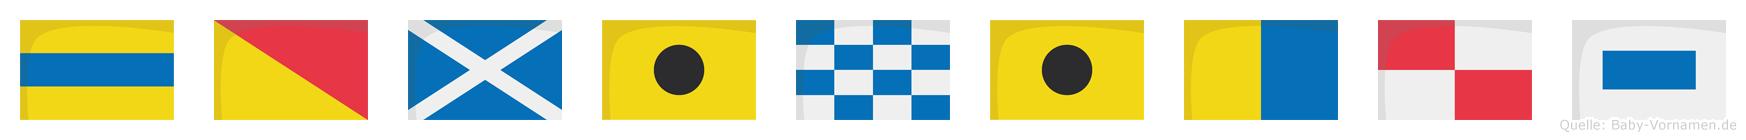 Dominikus im Flaggenalphabet